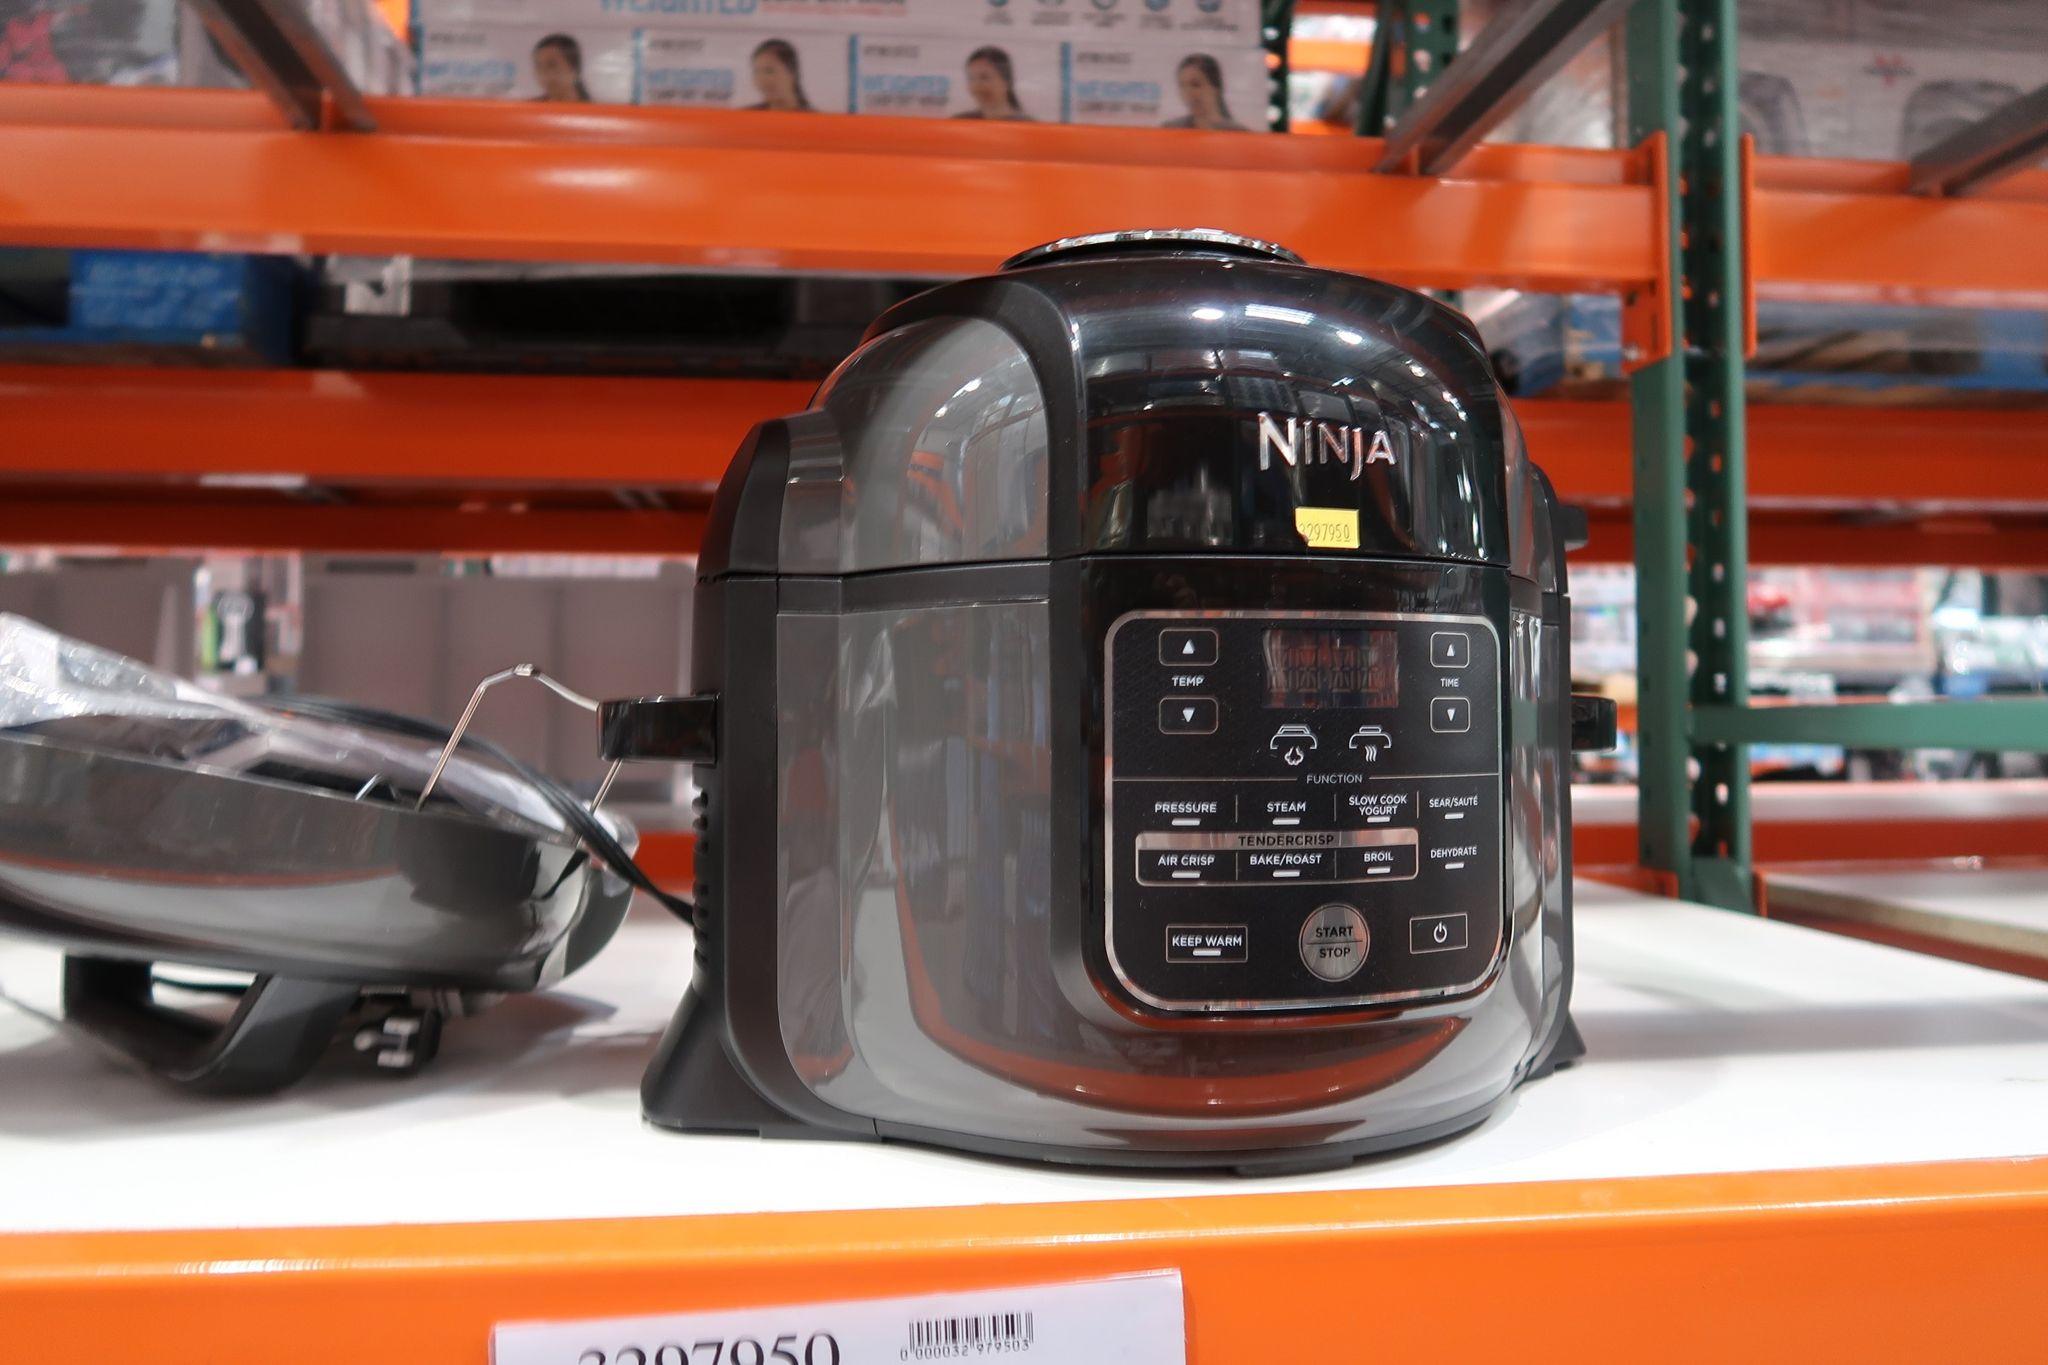 Ninja Foodi 6.5 QT Pressure Cooker Air Fryer ON SALE